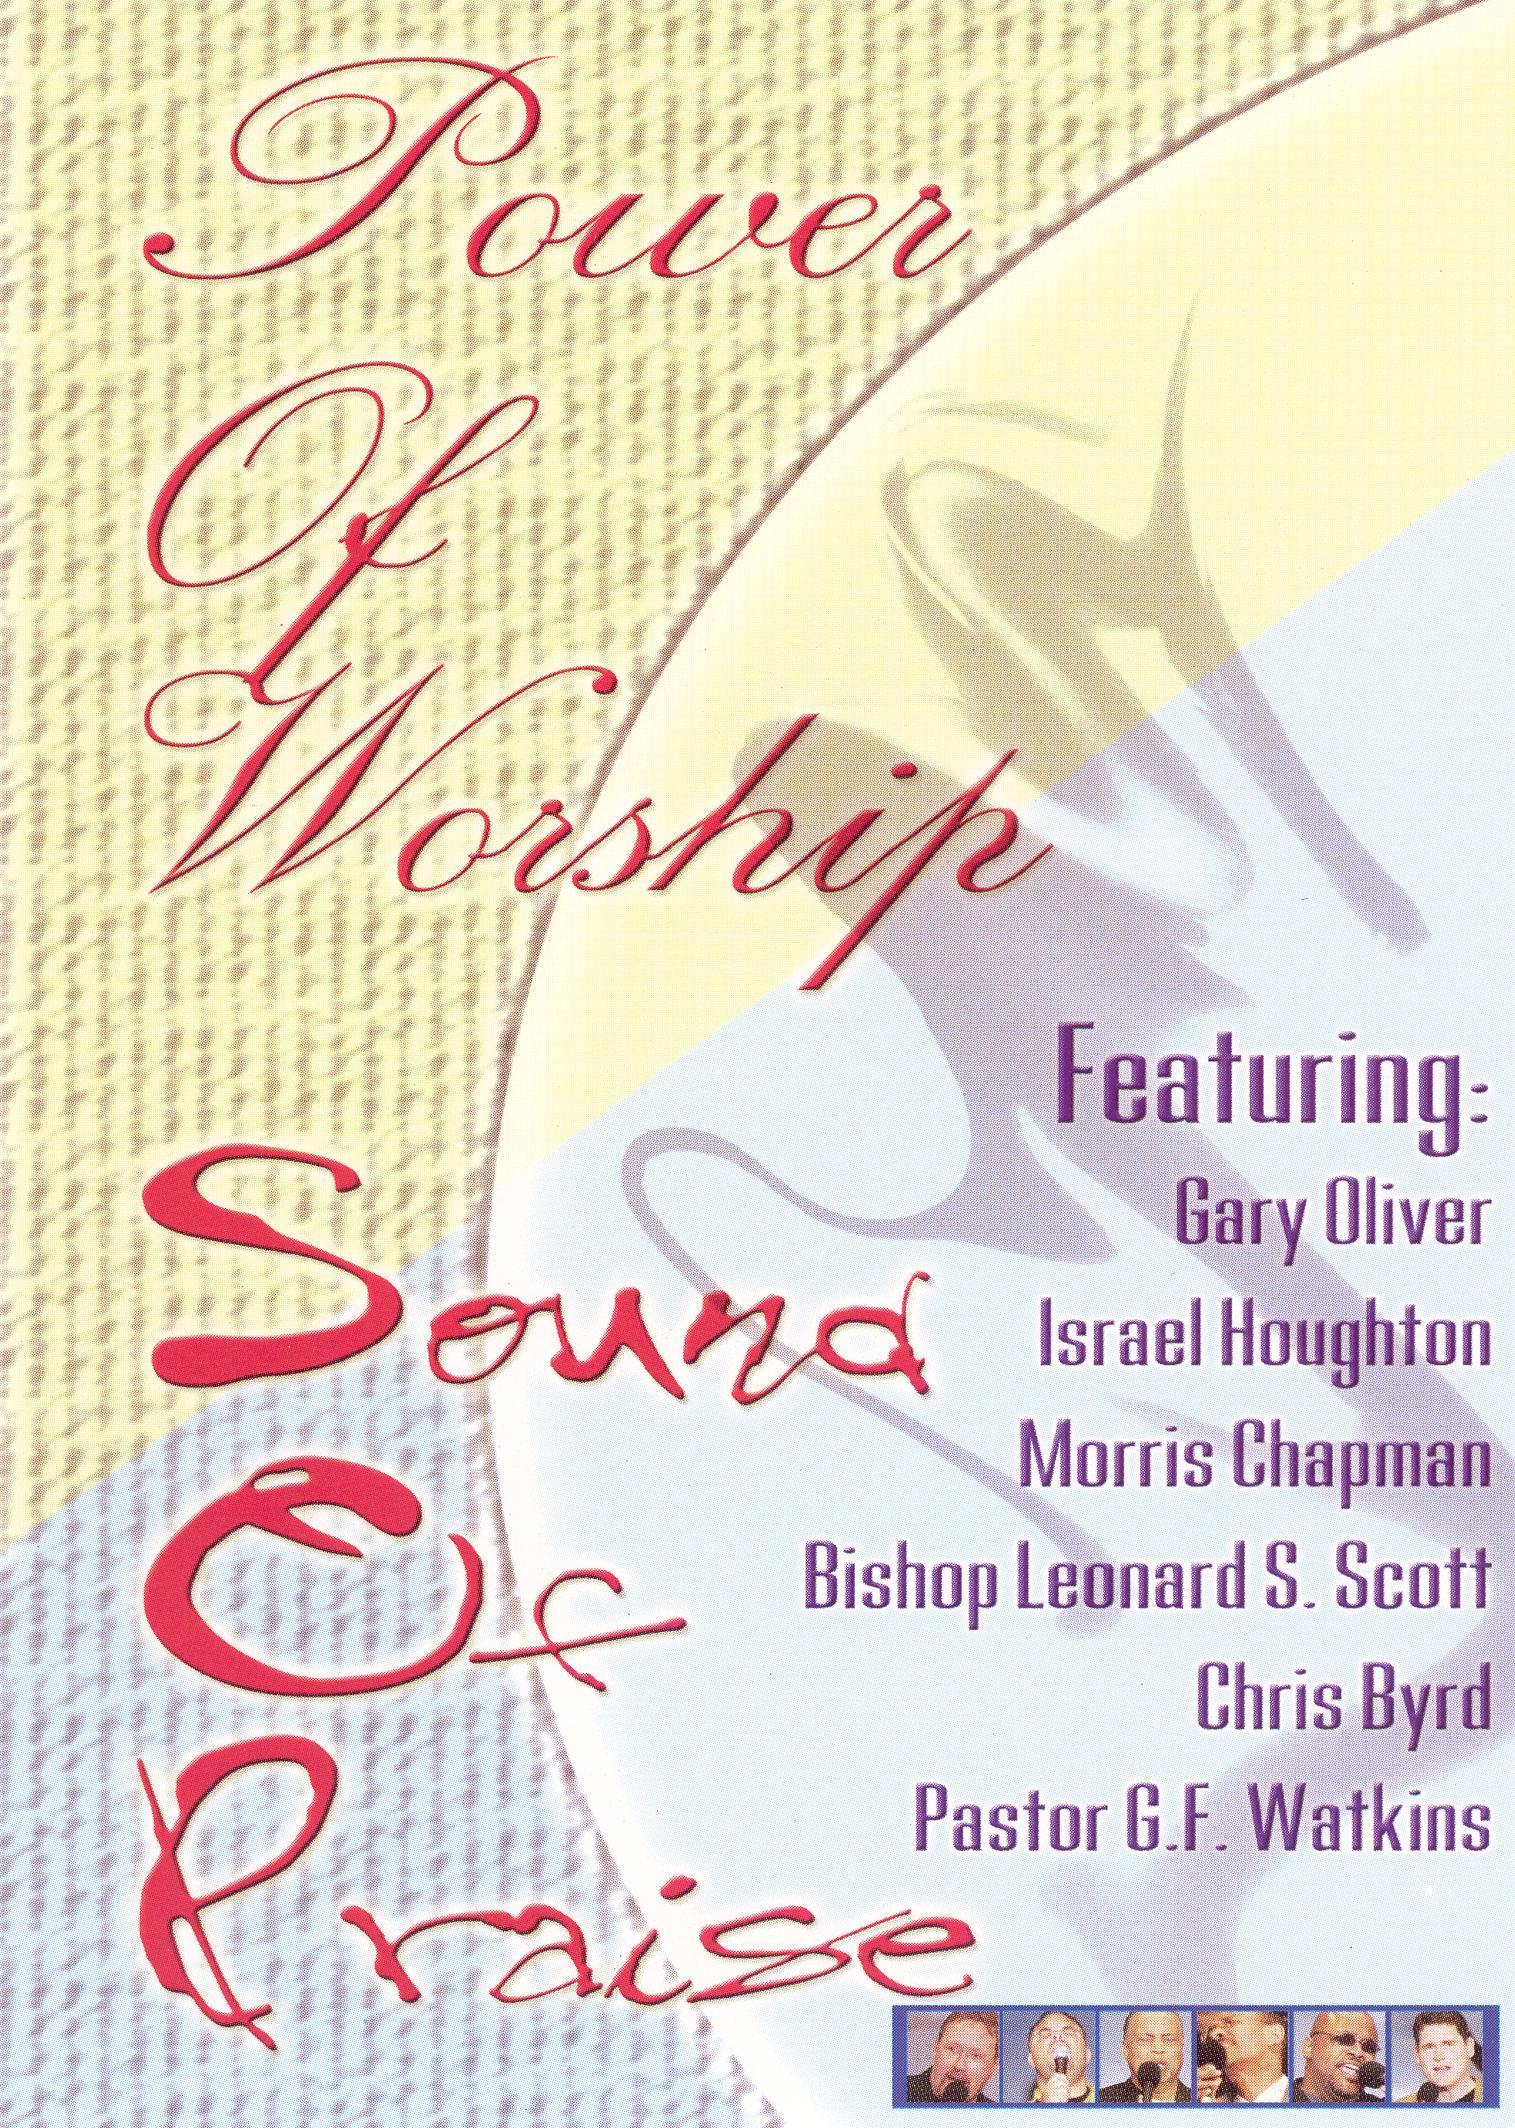 Power of Worship: Sound of Praise